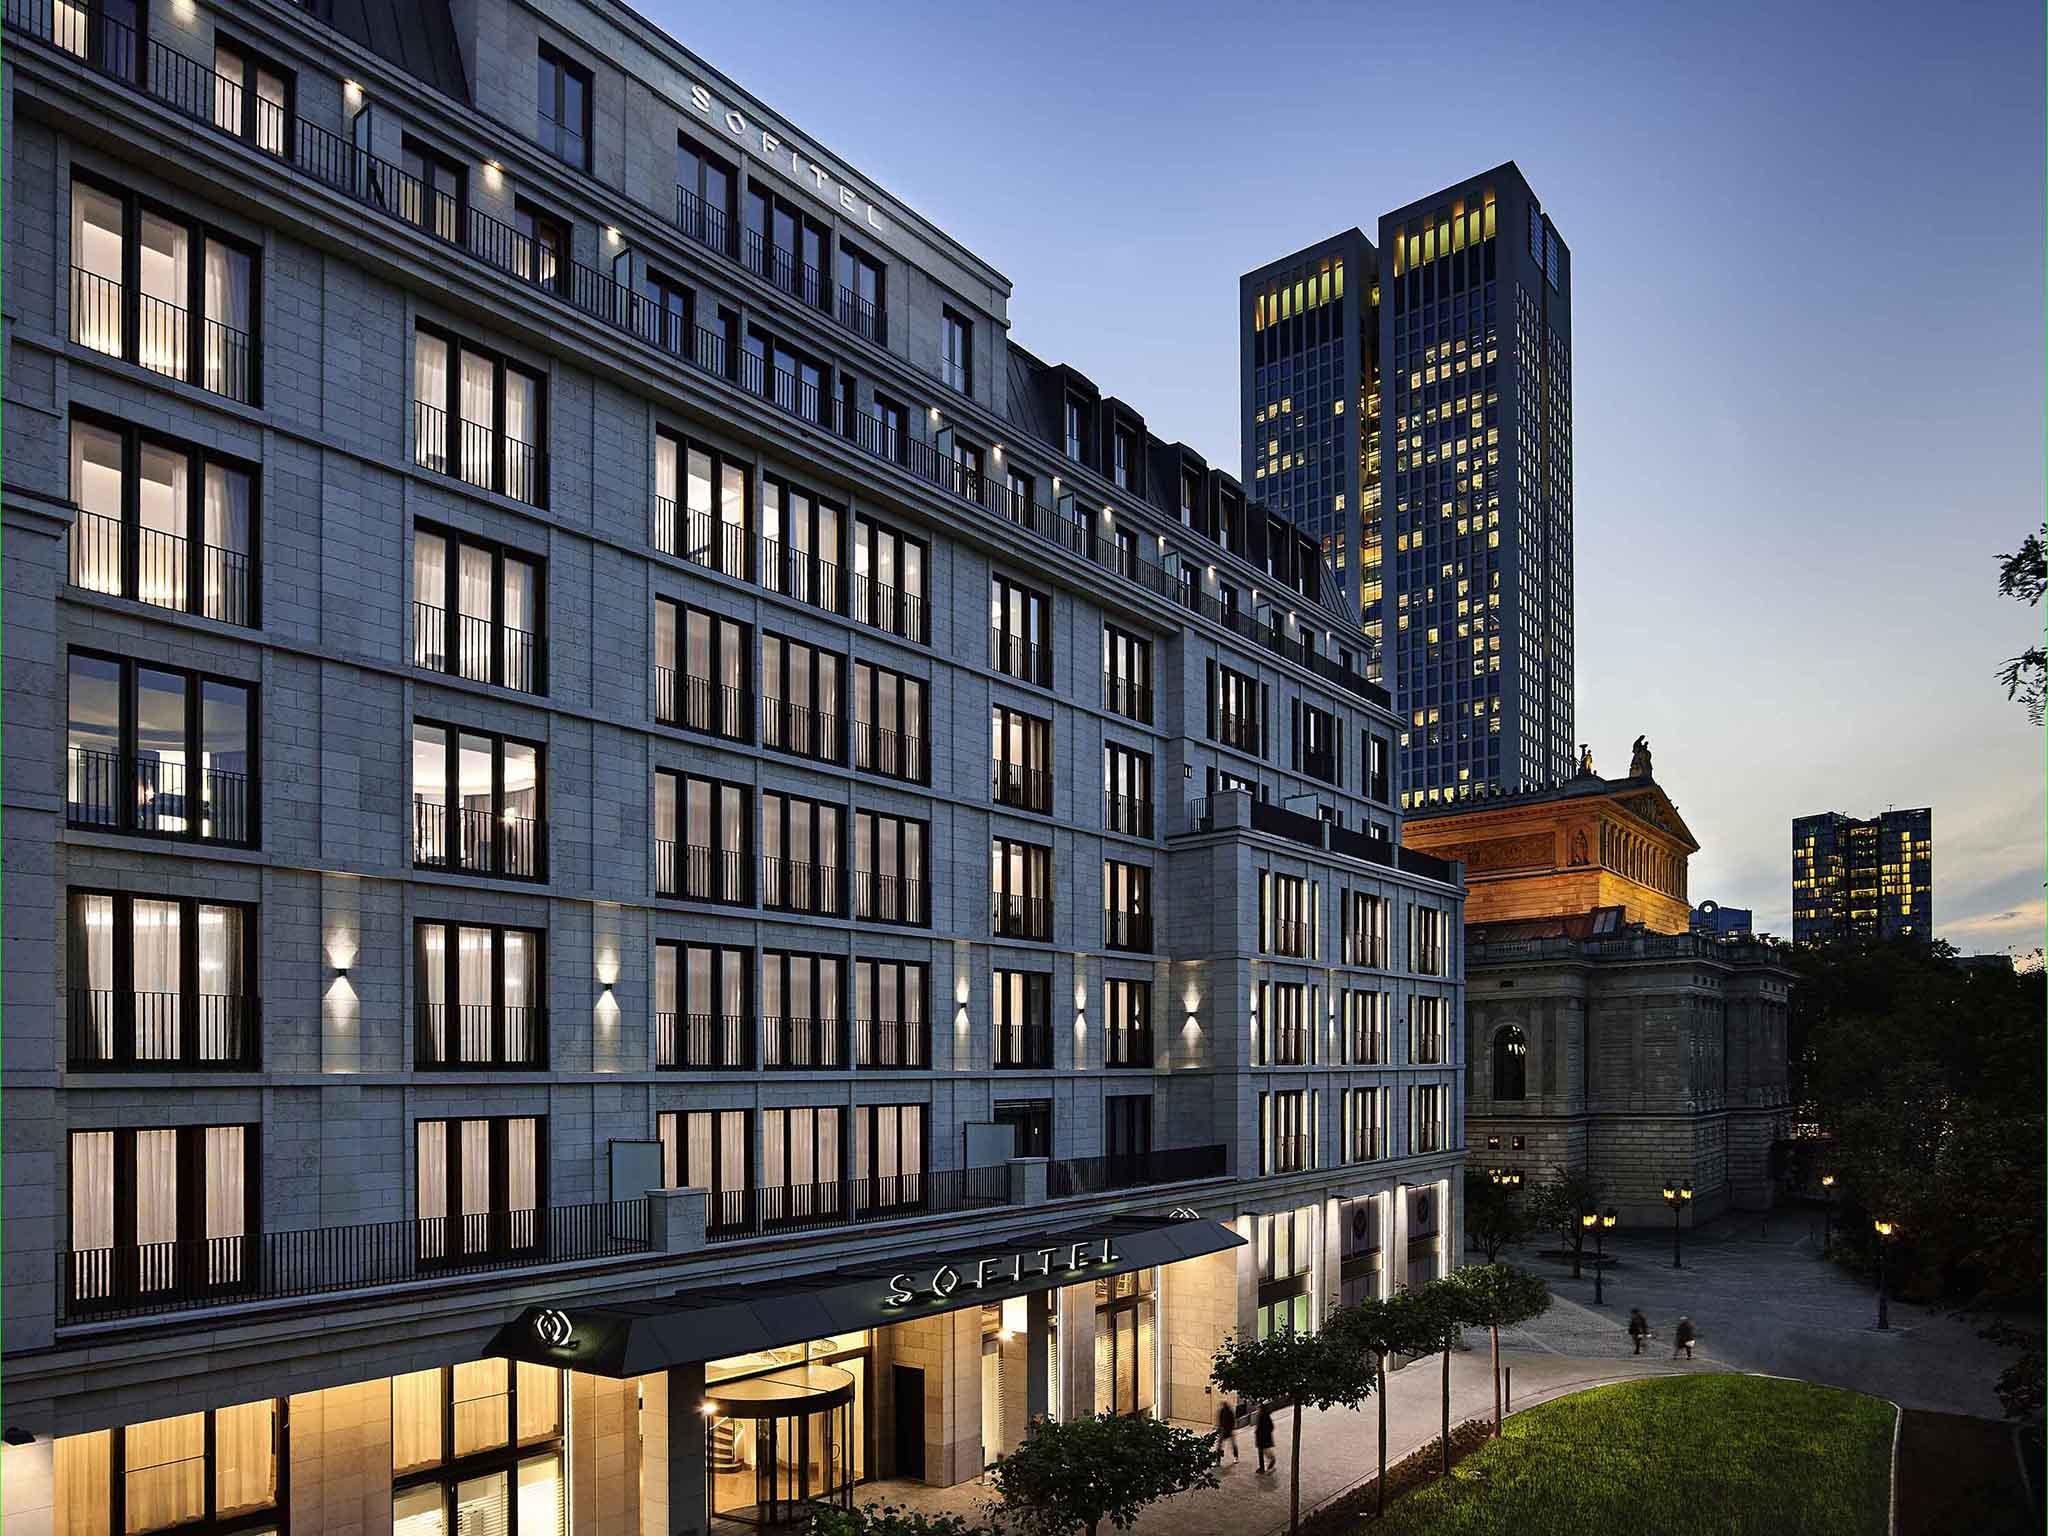 Hotel Sofitel Frankfurt Opera